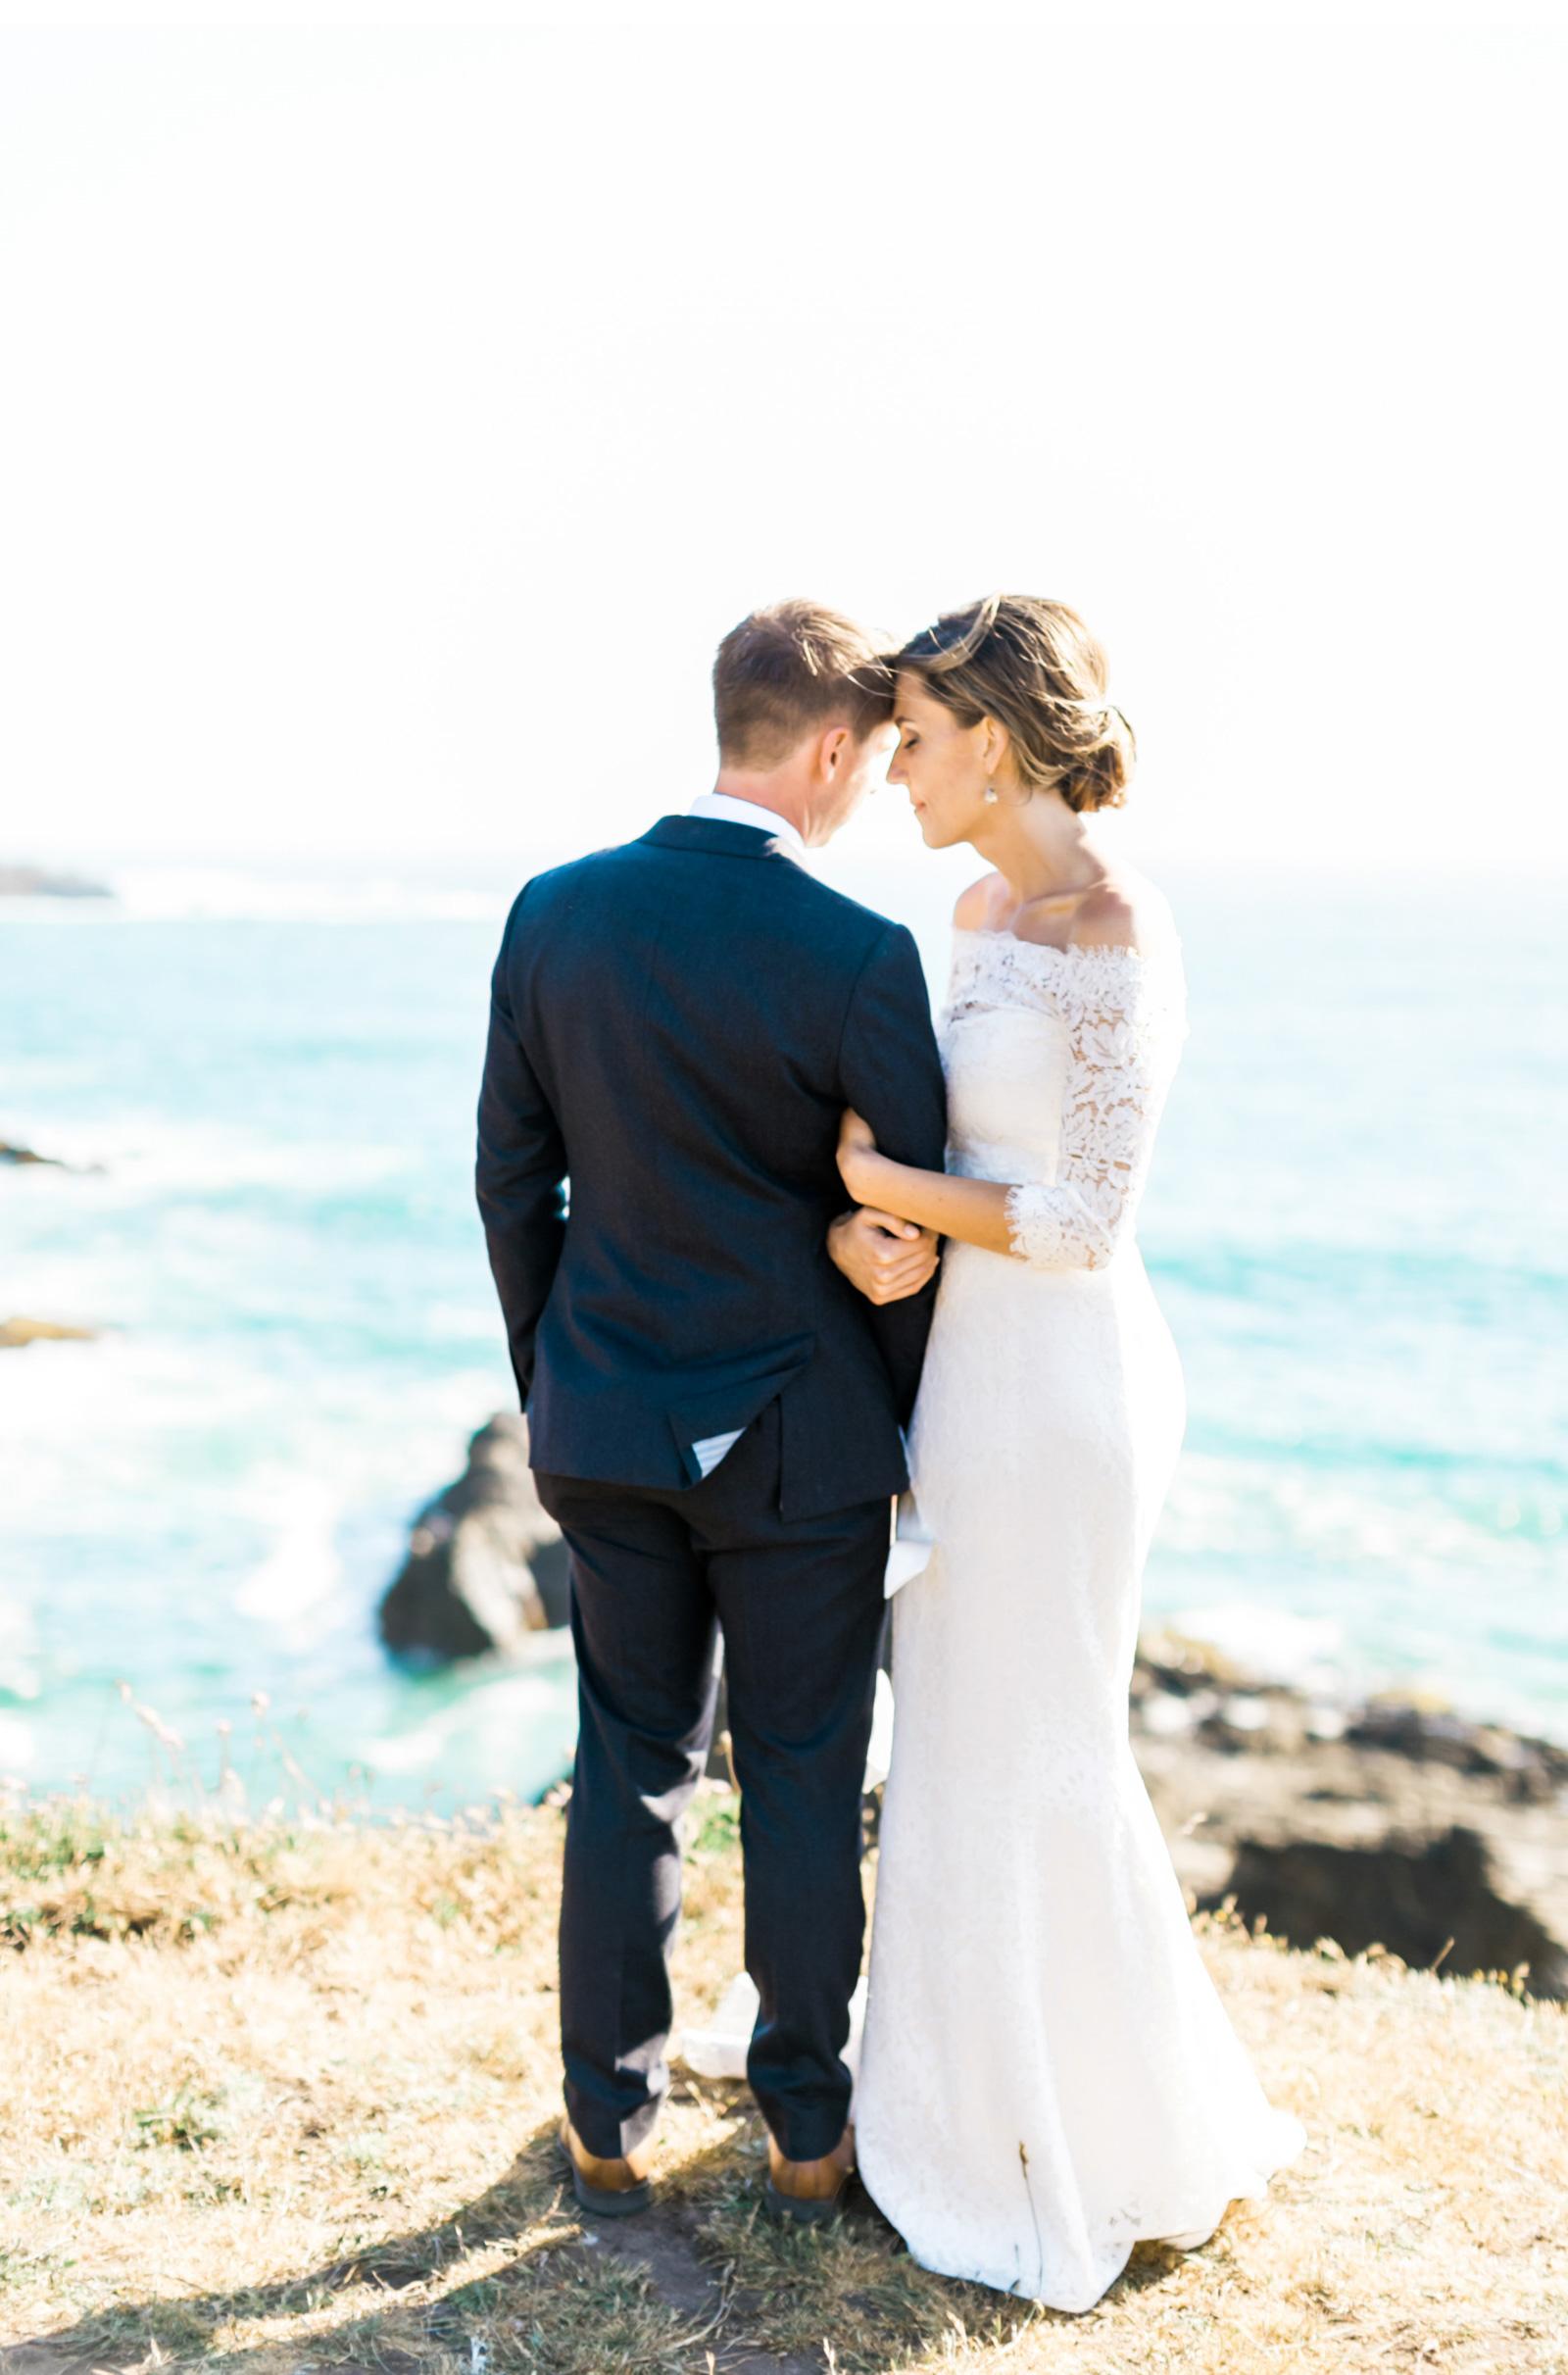 Style-Me-Pretty-Mendocino-Wedding-Natalie-Schutt-Photography_07.jpg